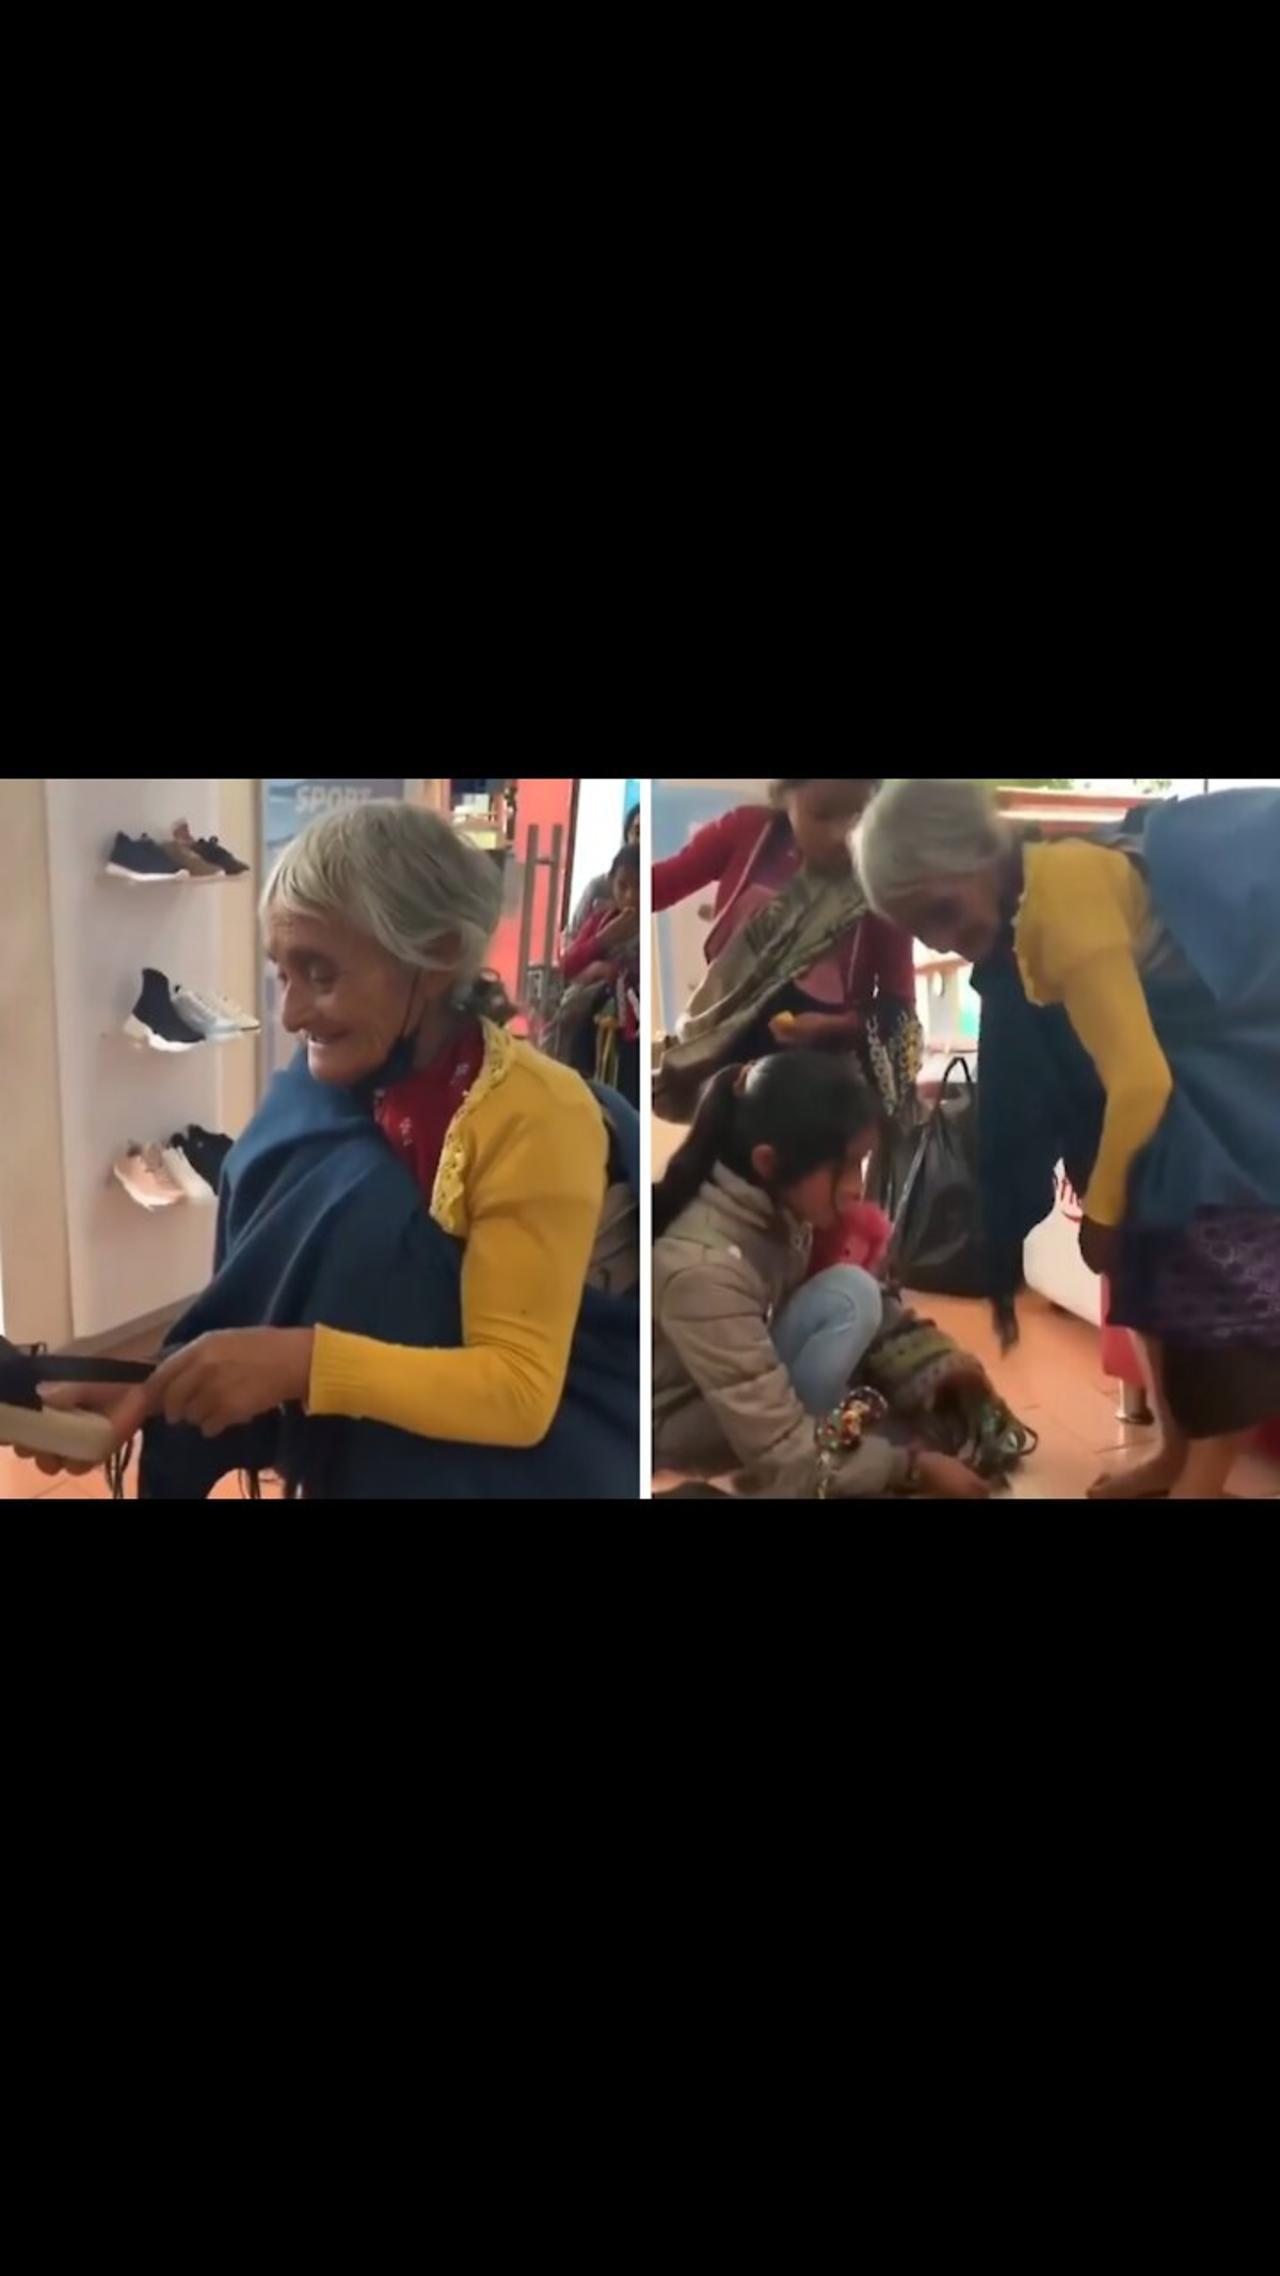 Shoeless indigenous elder surprised with new sandals